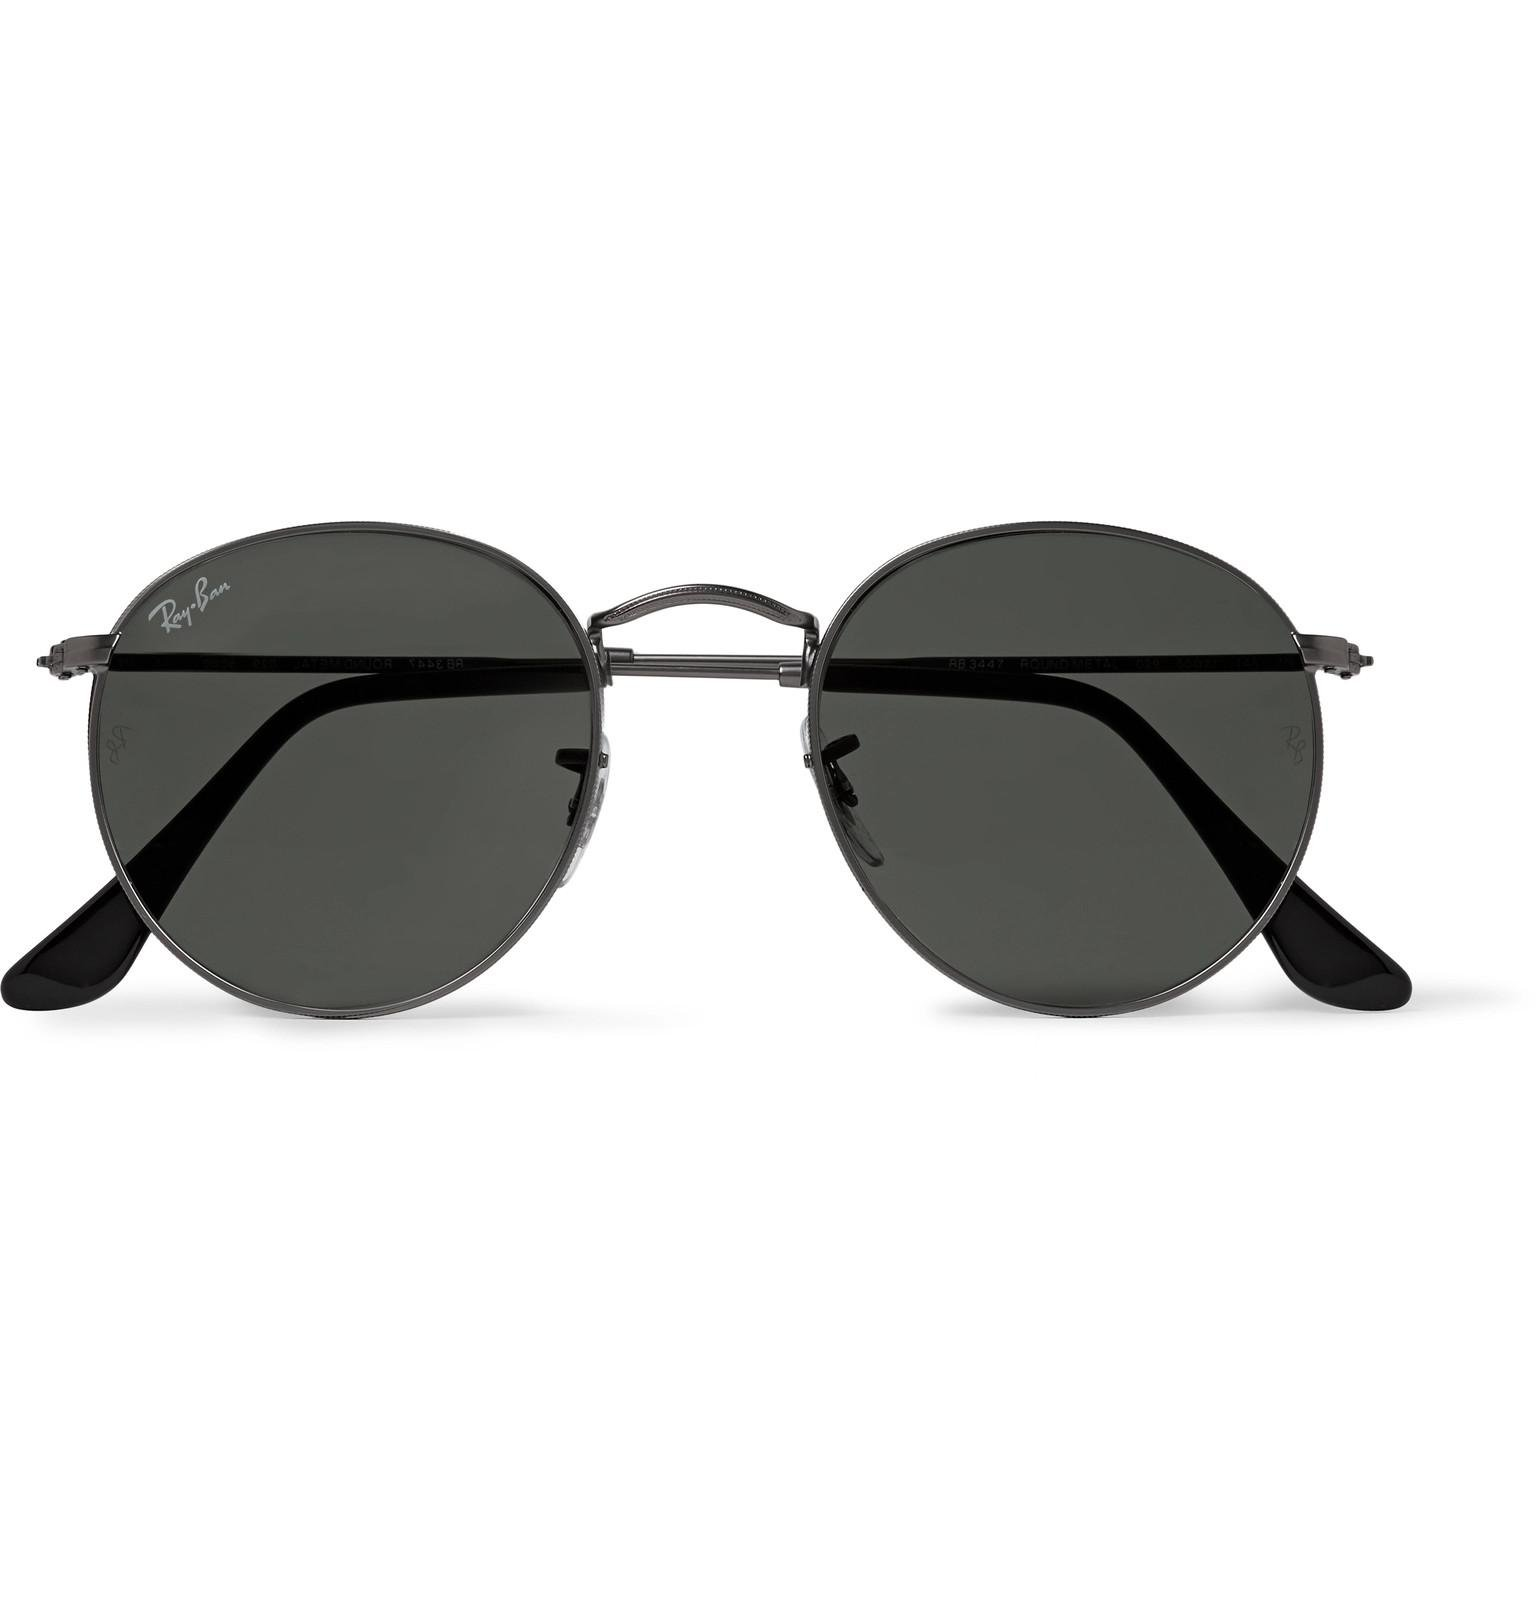 c2cae98e43 Ray-Ban Round-frame Gunmetal-tone Sunglasses for Men - Lyst